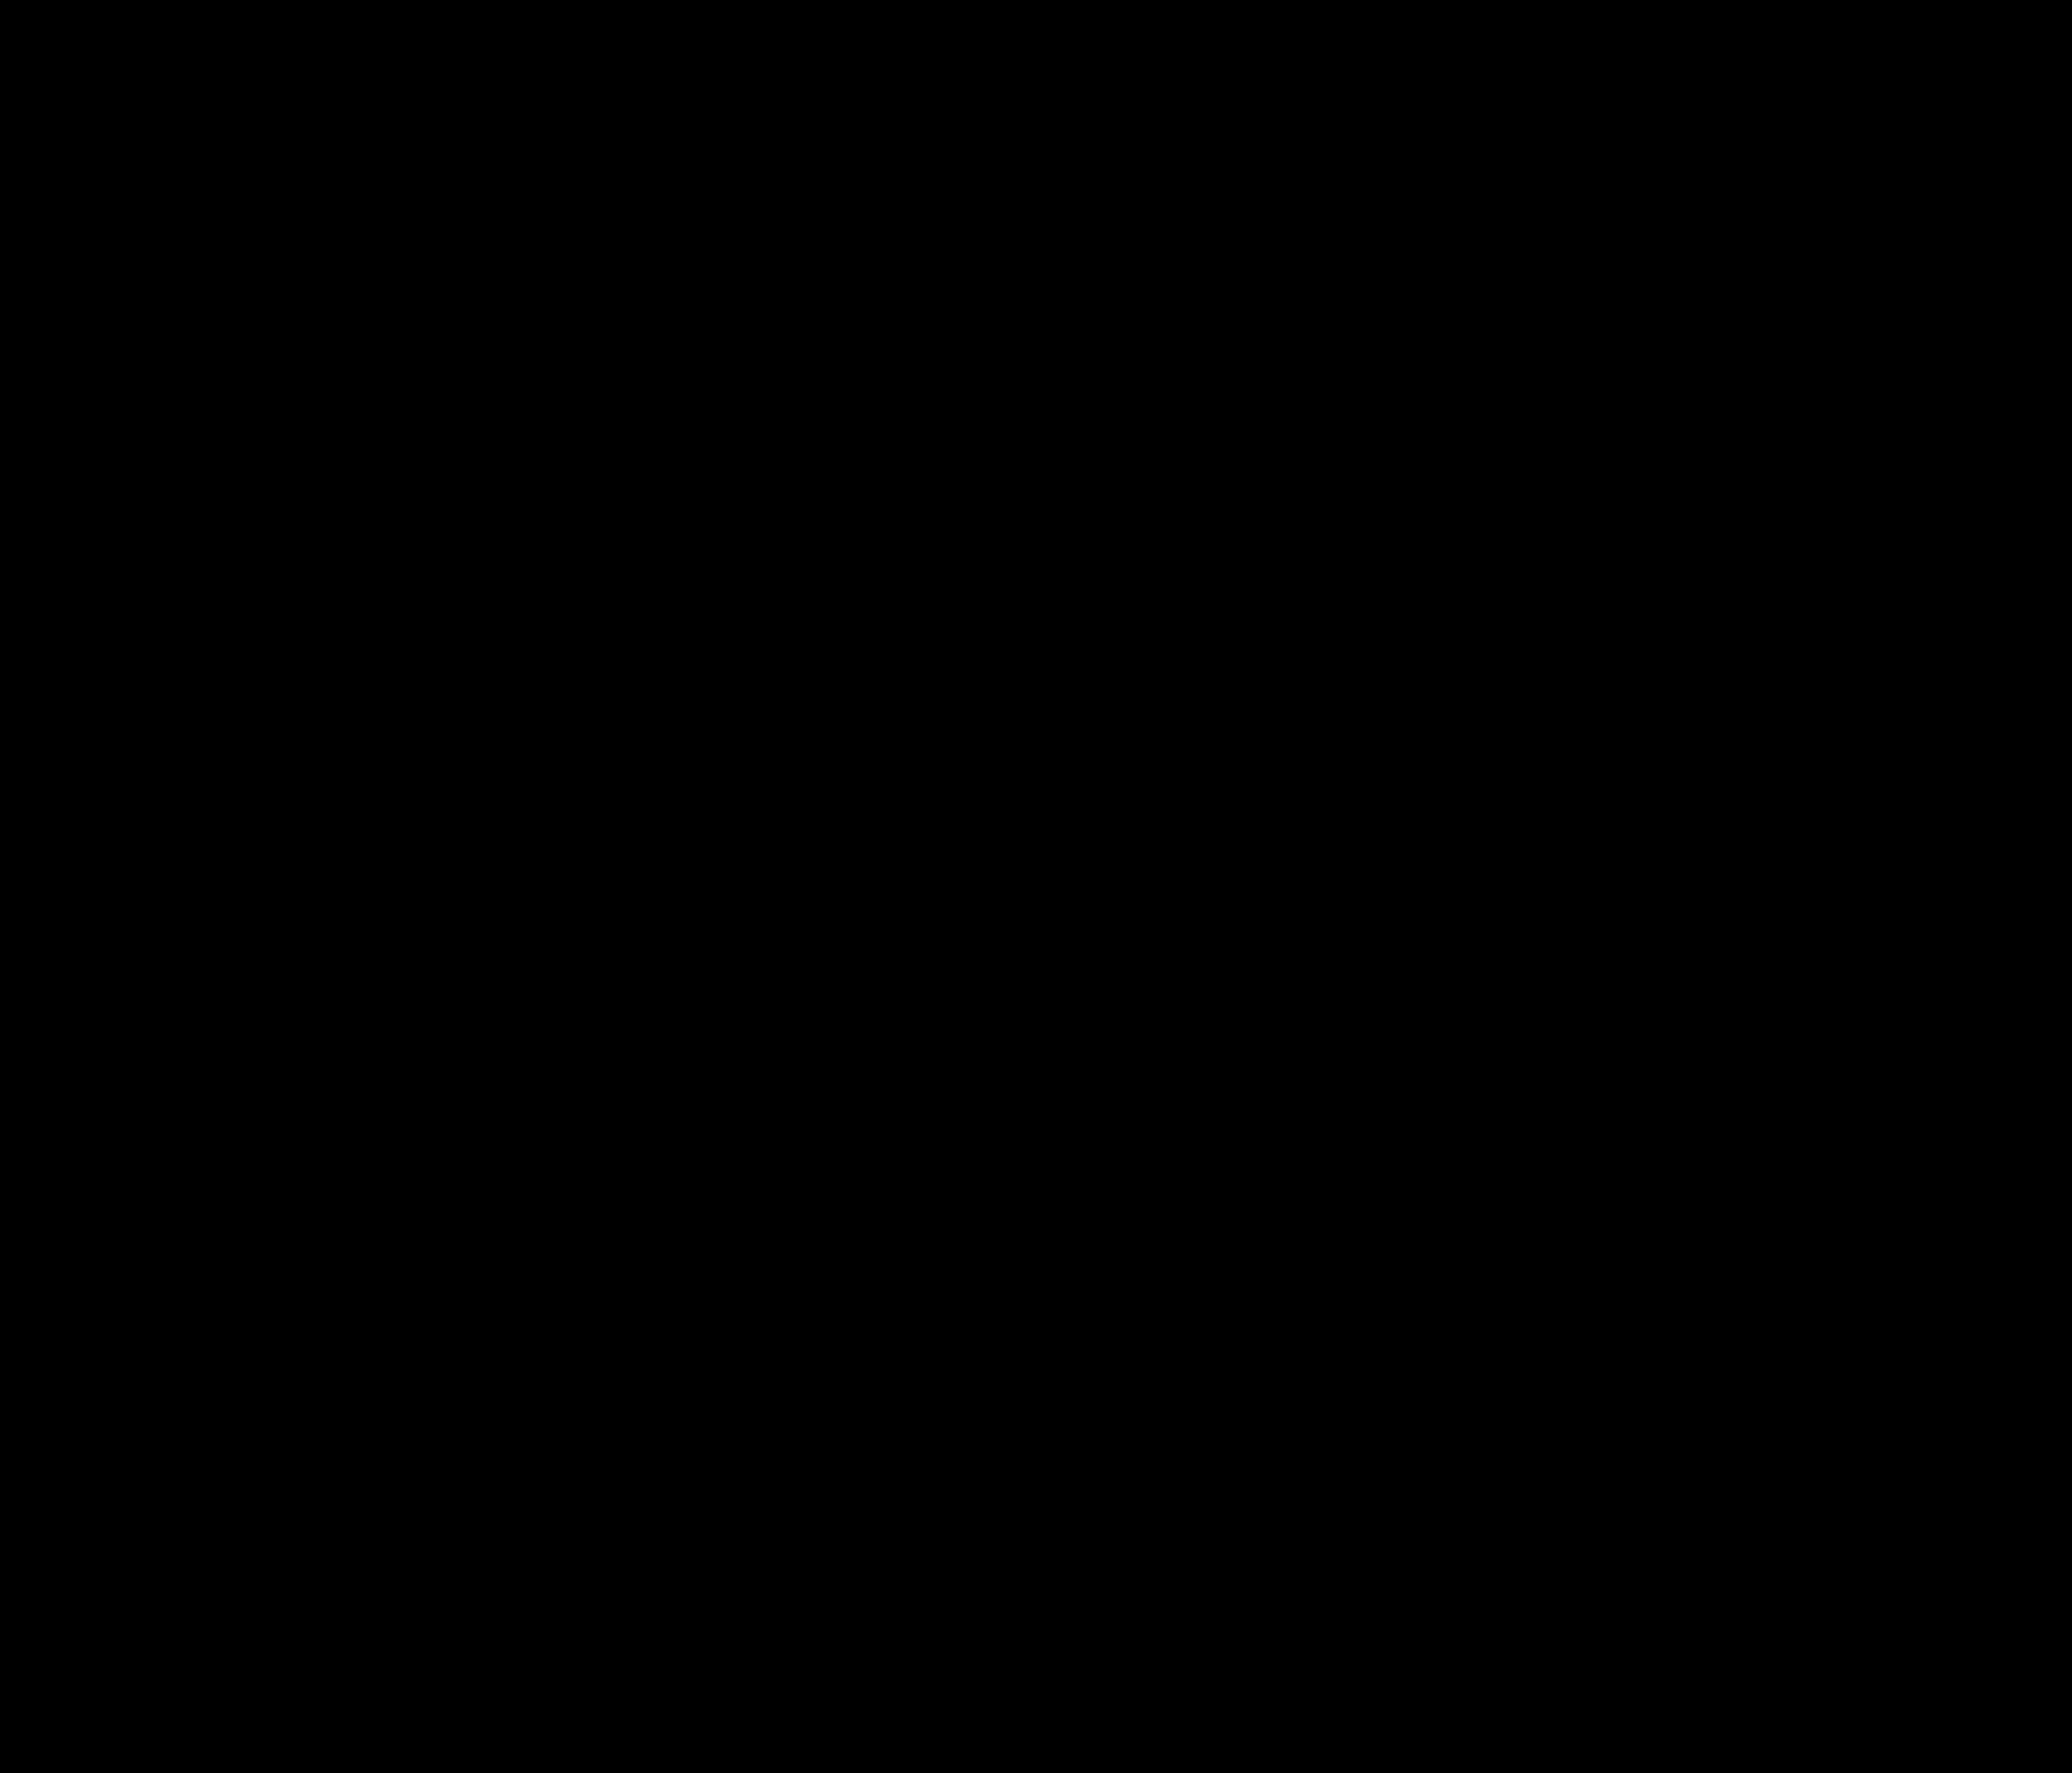 2302x1970 Clipart